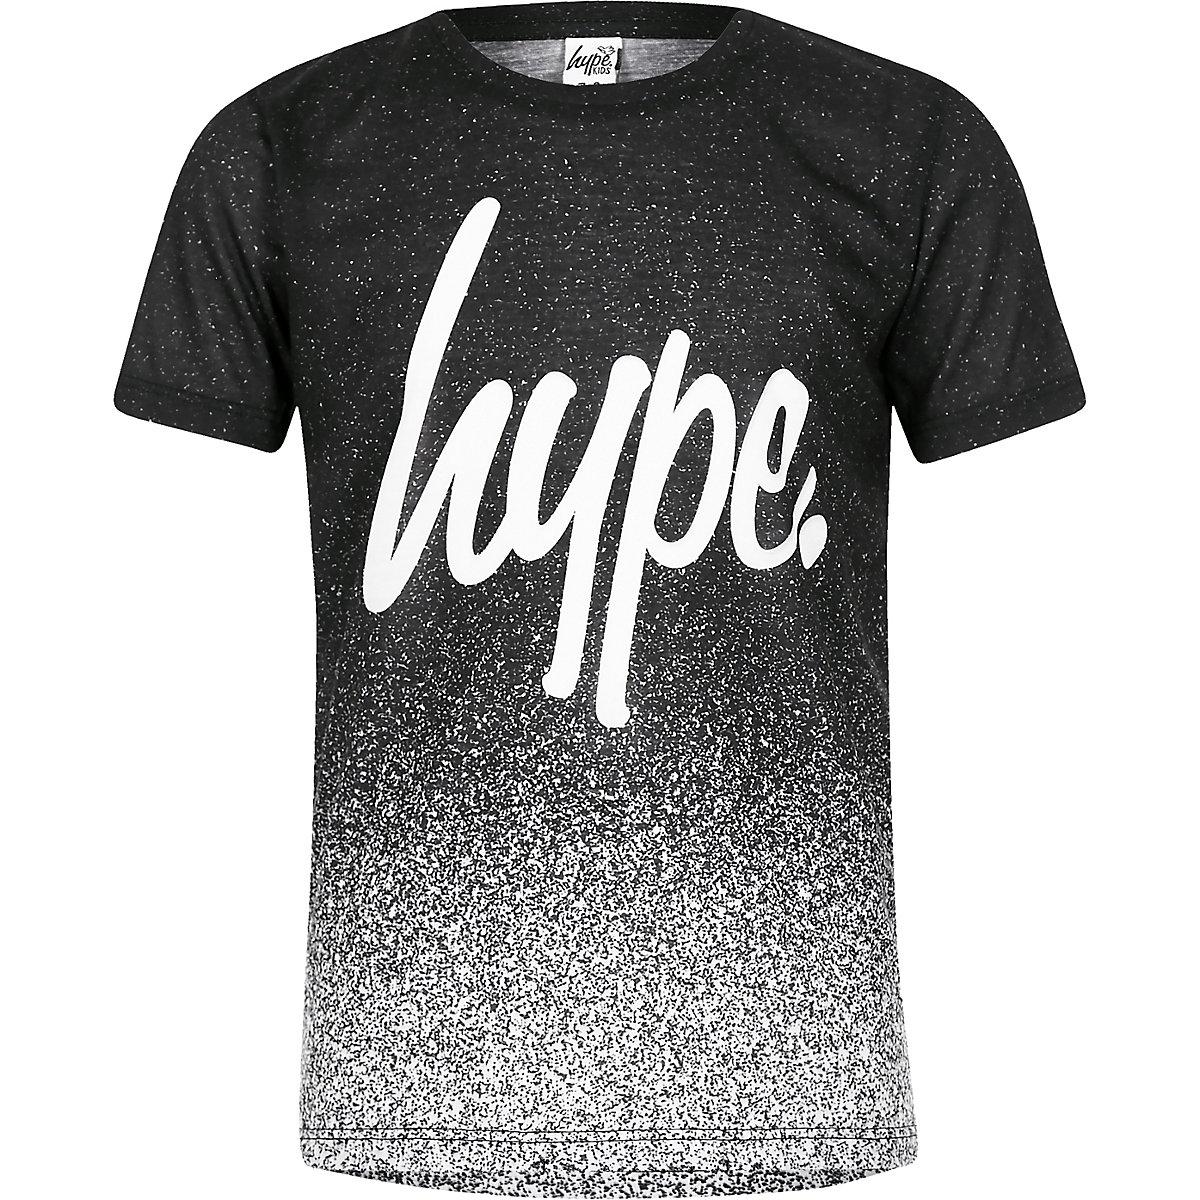 Boys Hype black speckled T-shirt